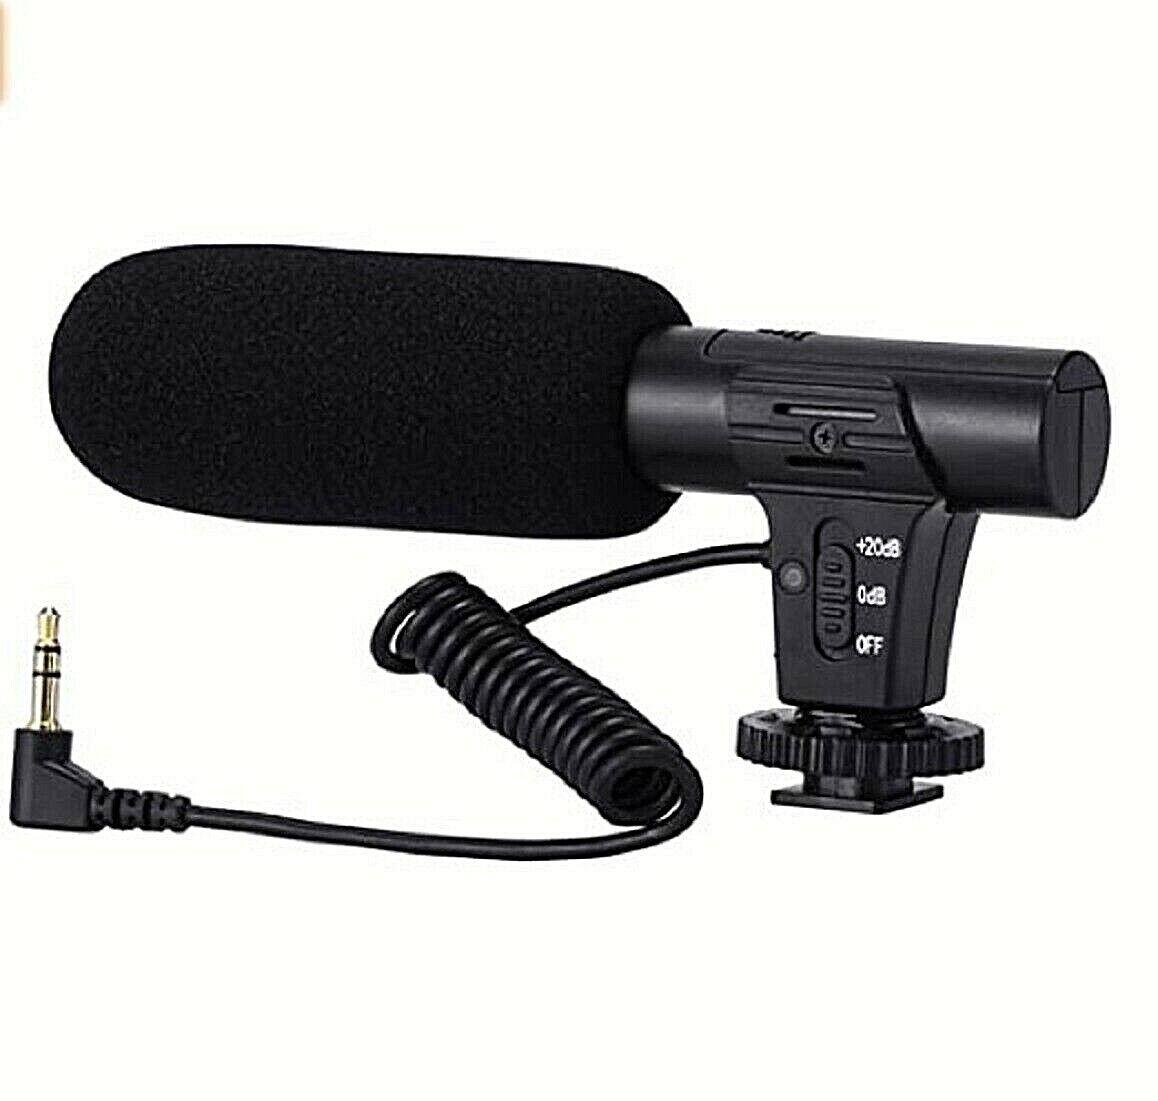 Video Microphone Camera Microphone for Canon, Sony, Nikon, DSLR Camera/DV 3.5 mm Camera, Drone & Photo Accessories